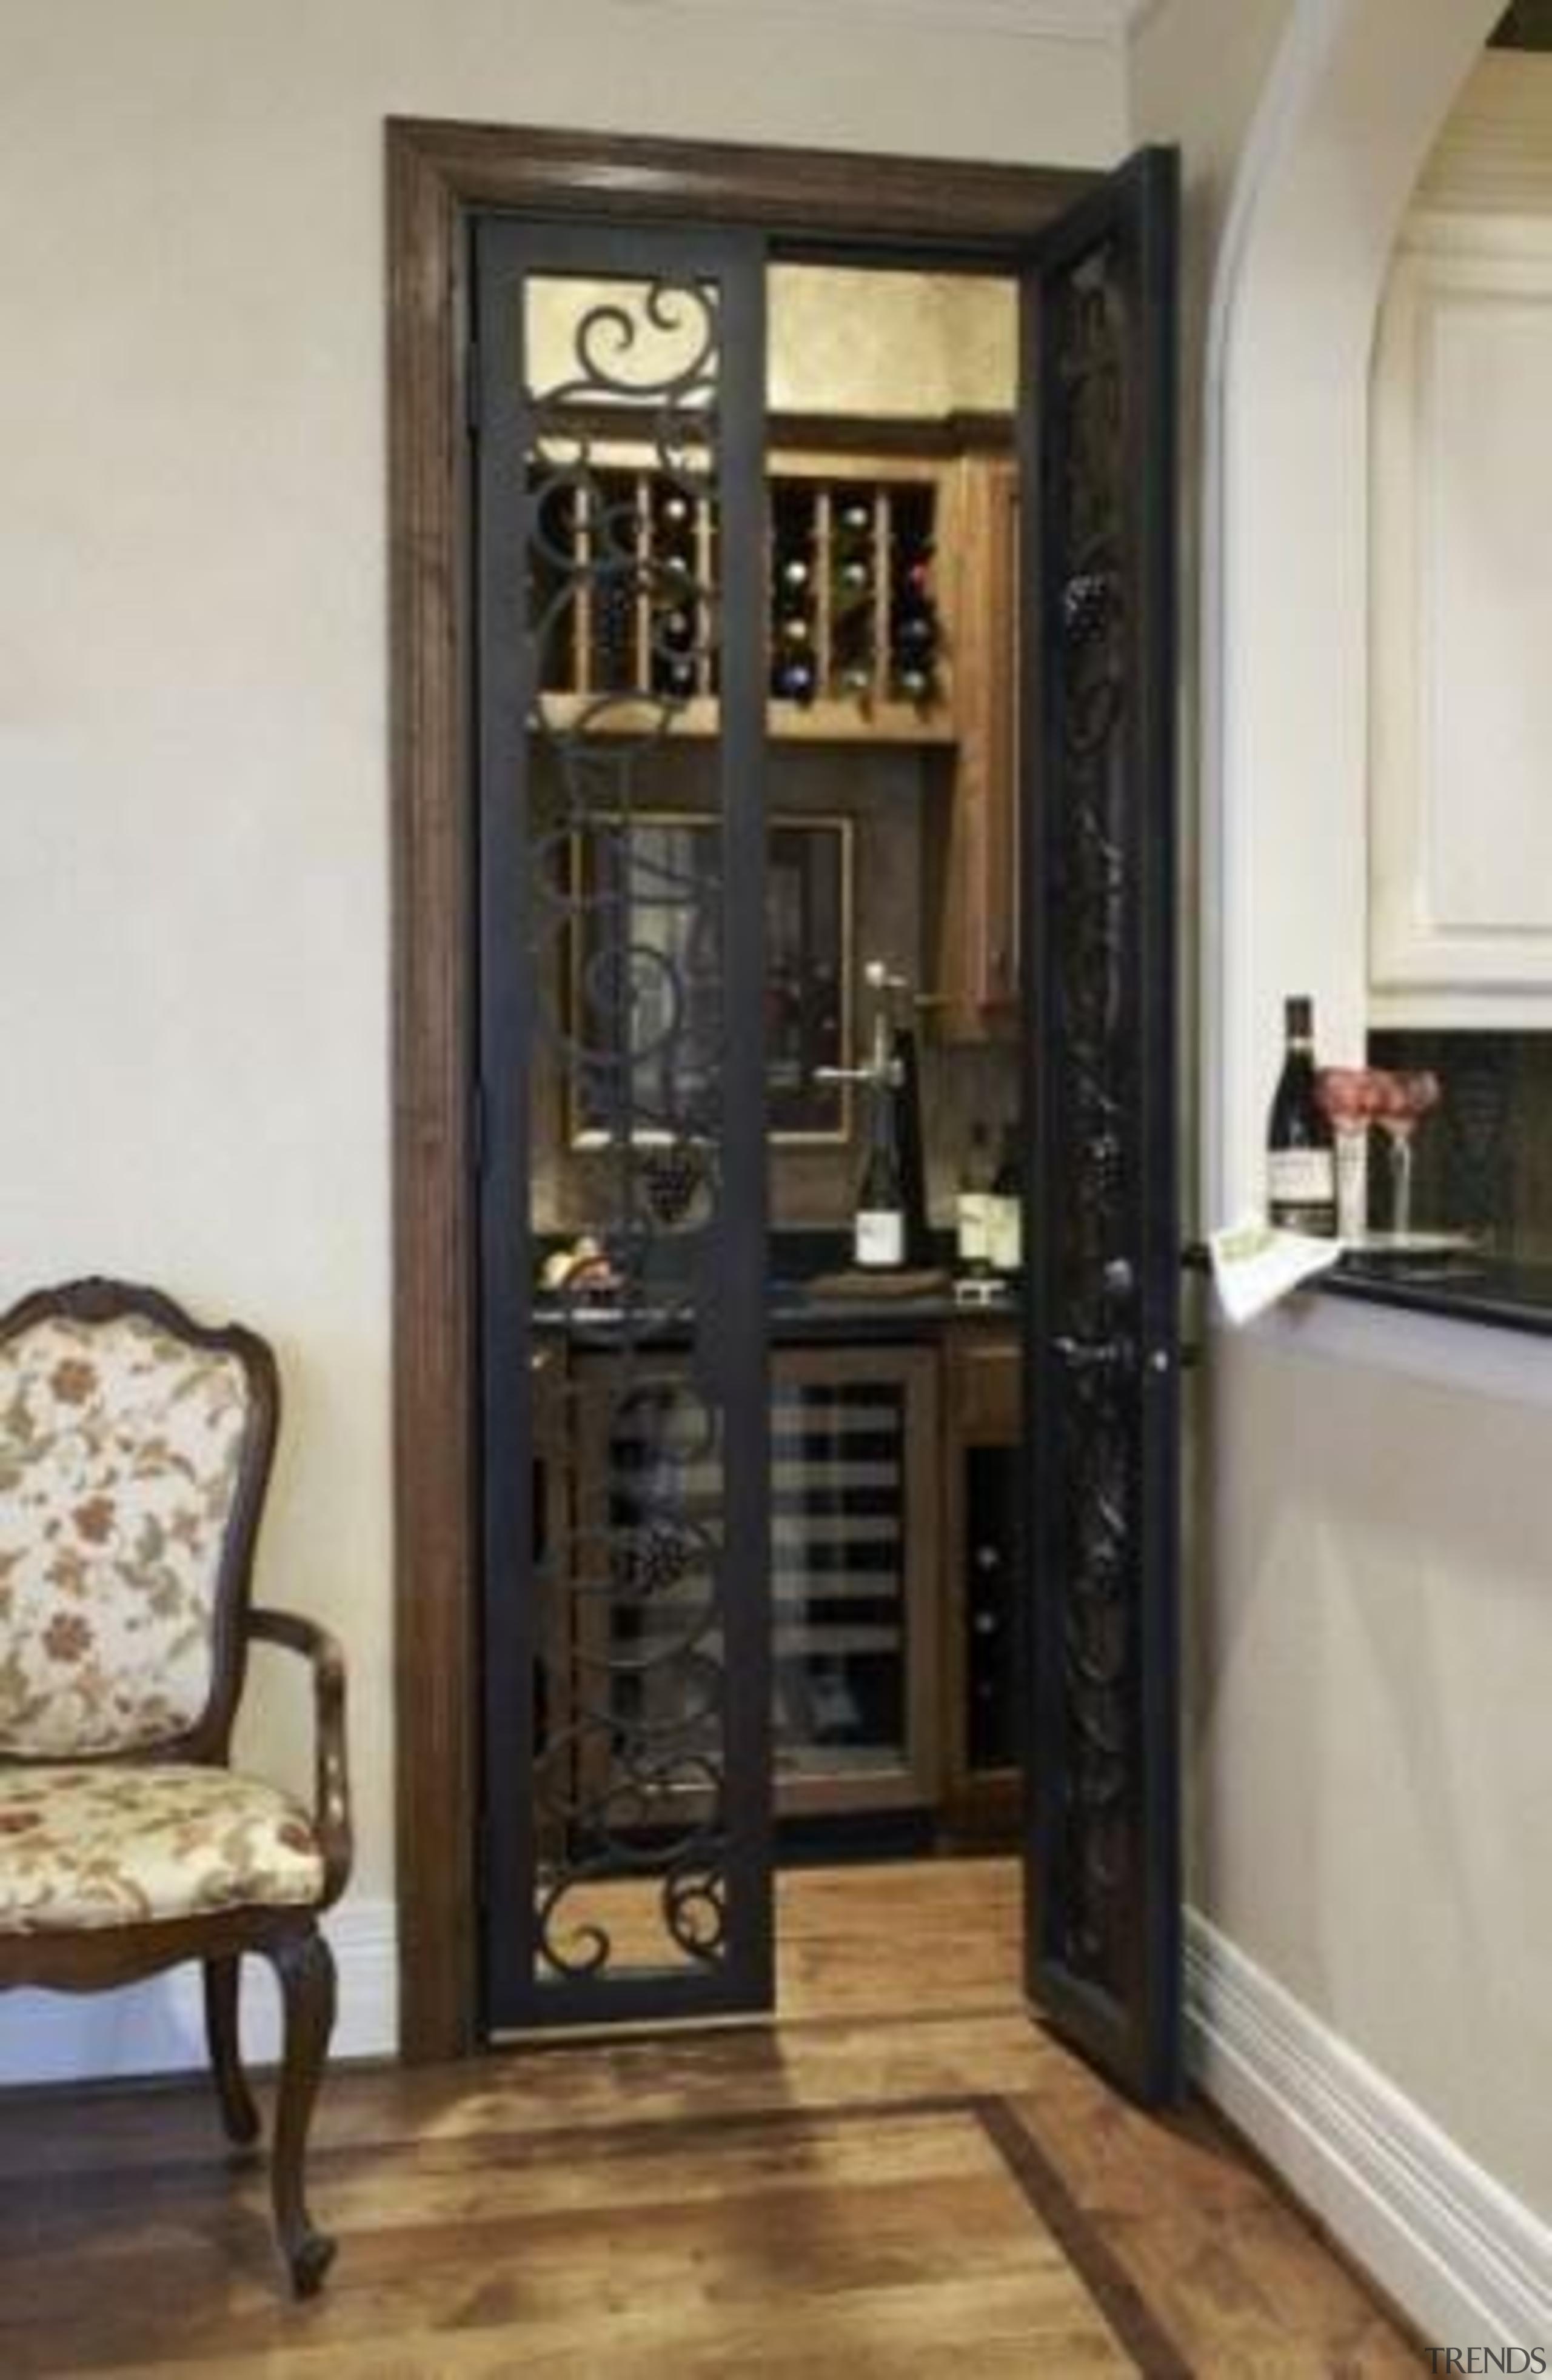 Modern Wine Cellar Ideas - Modern Wine Cellar cabinetry, door, furniture, gray, black